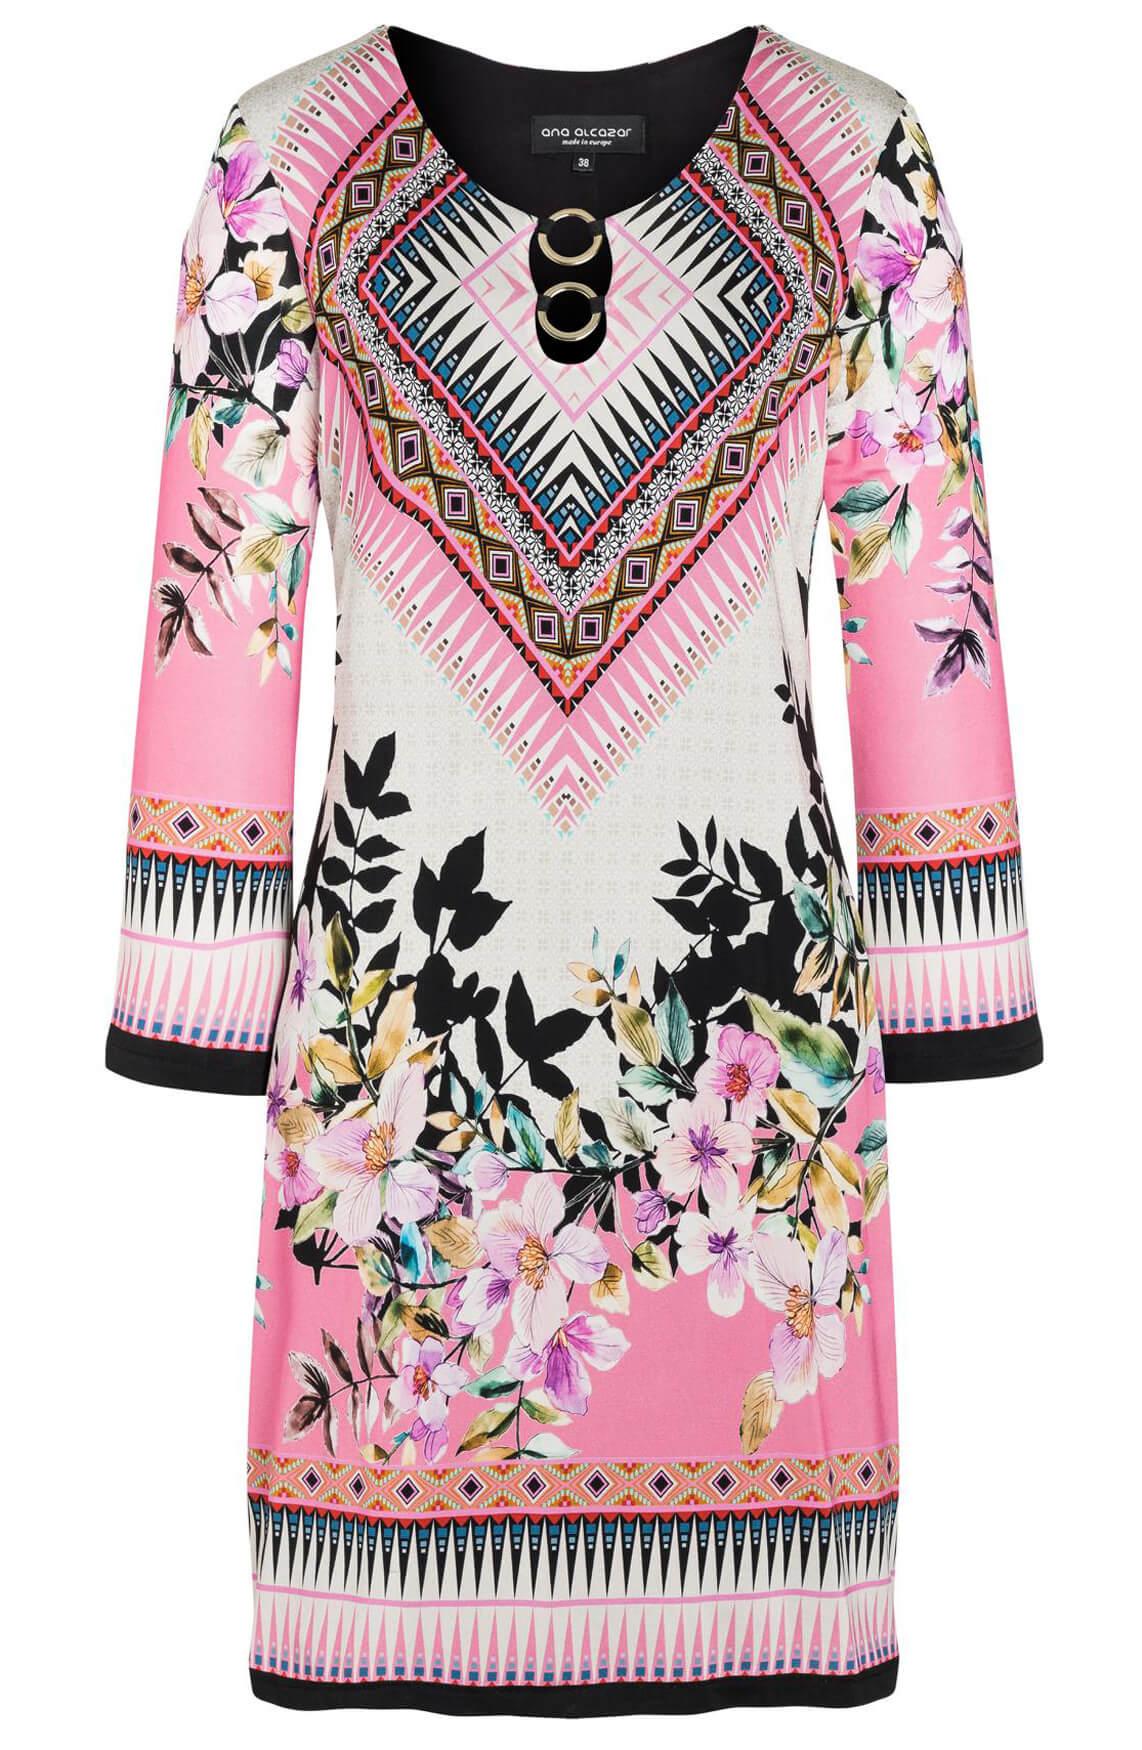 Ana Alcazar Dames Shella jurk met print roze